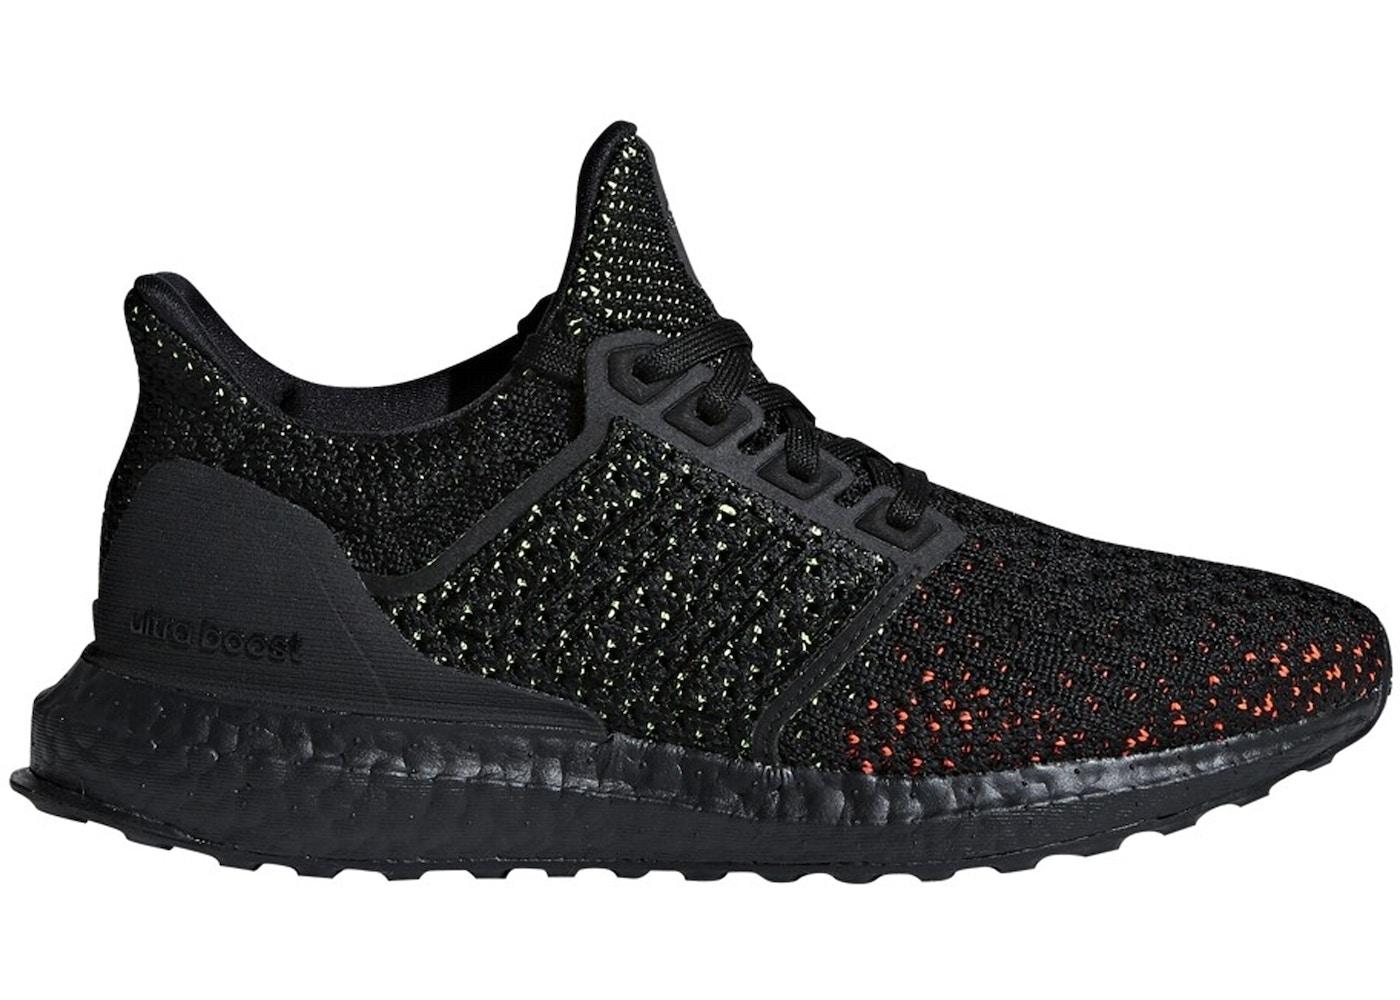 check out 7df47 6c3e7 adidas Ultra Boost Clima Core Black Solar Red (GS)